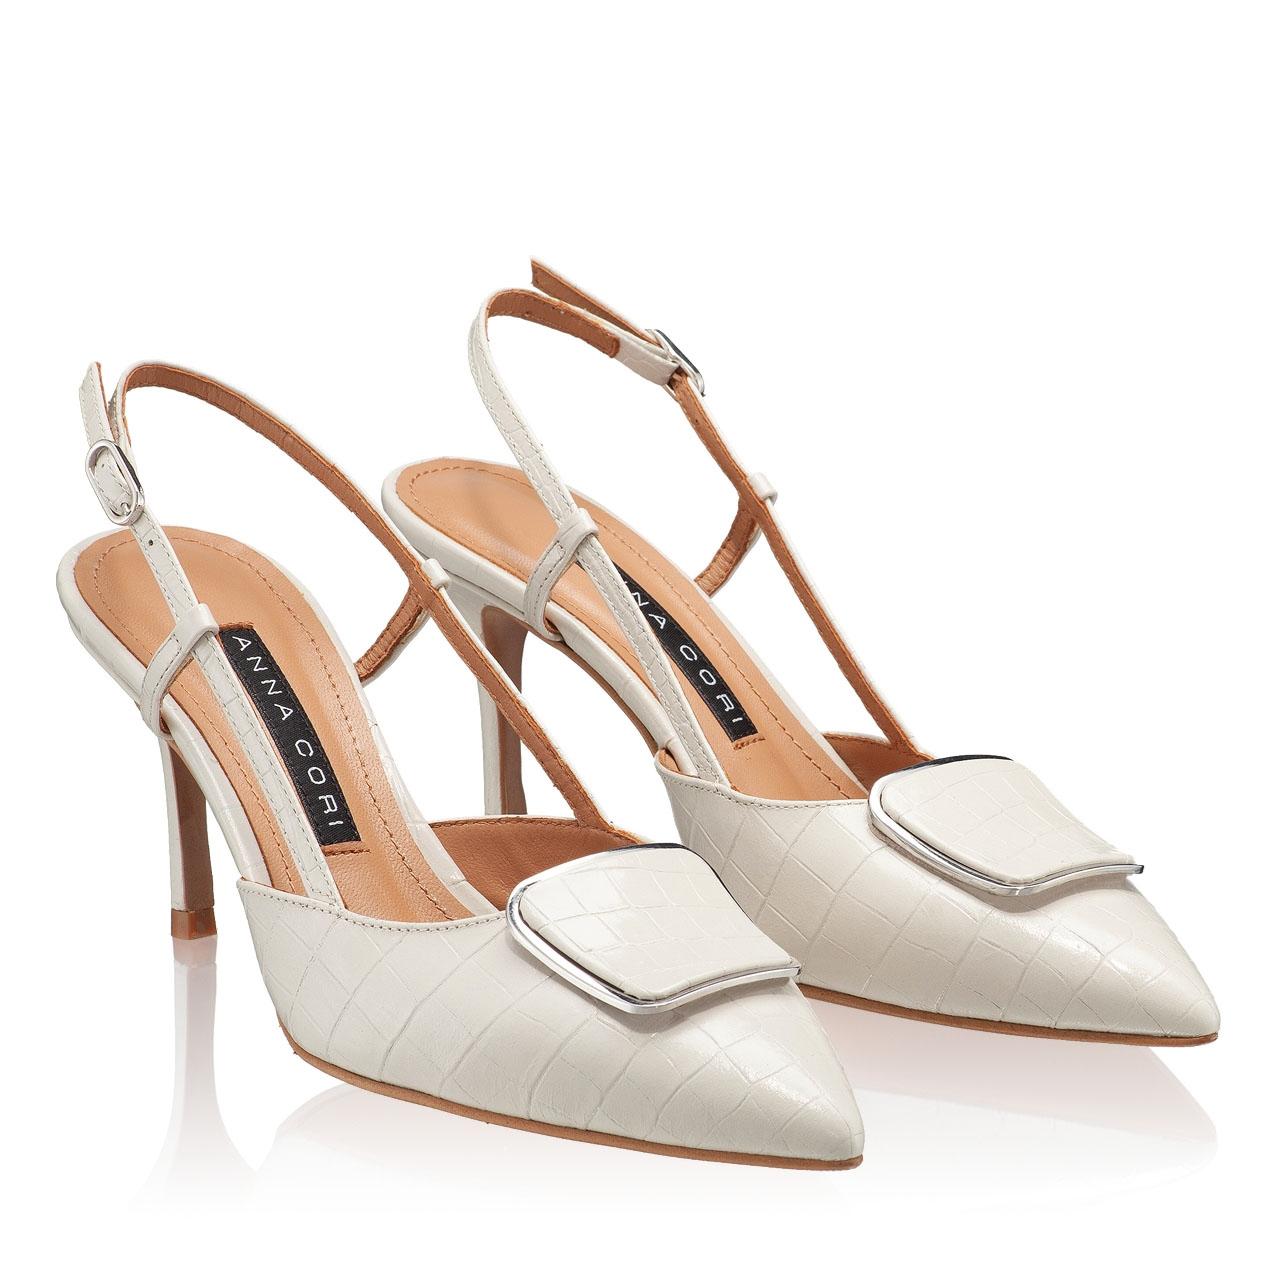 Imagine Pantofi Decupati 5843 Croco Avorio